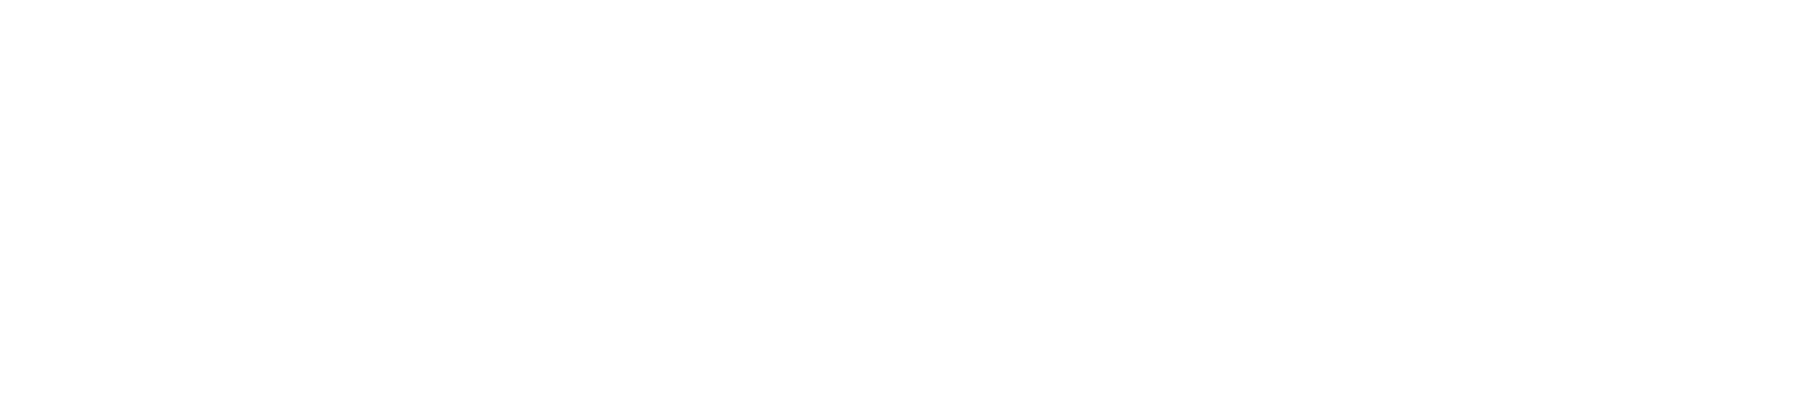 the_wheel_final